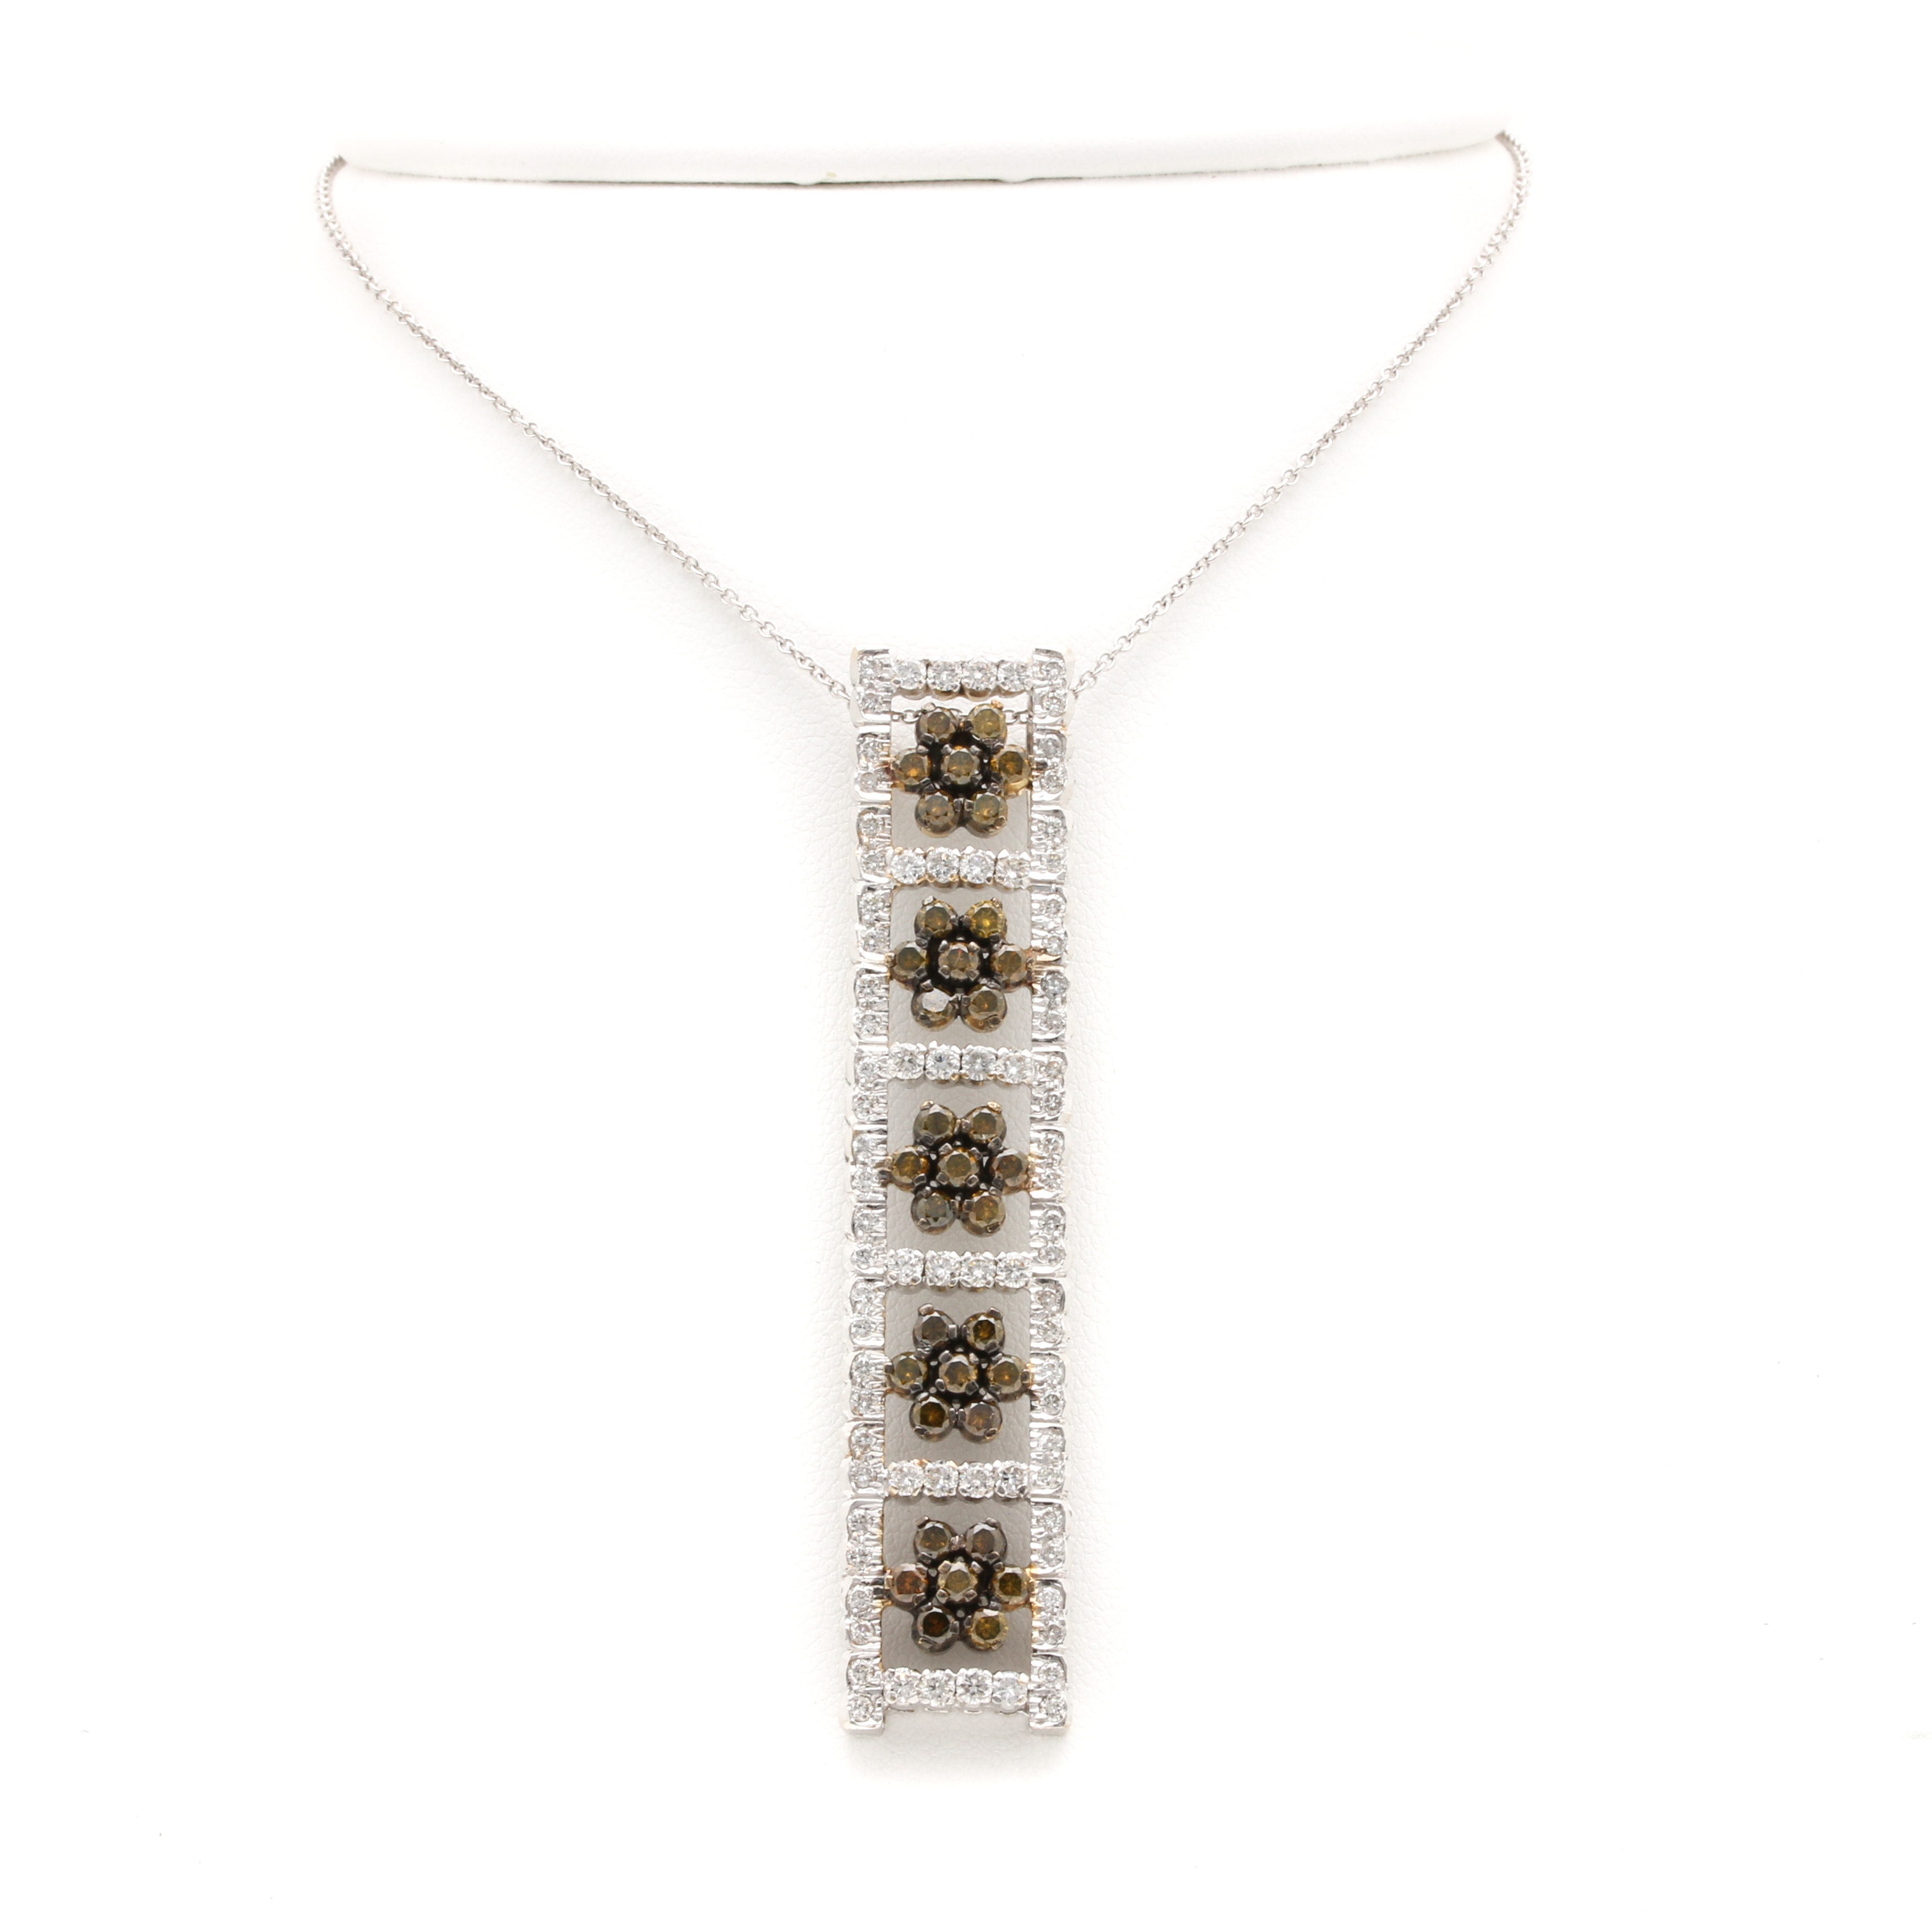 18K White Gold 3.30 CTW Diamond Pendant Necklace